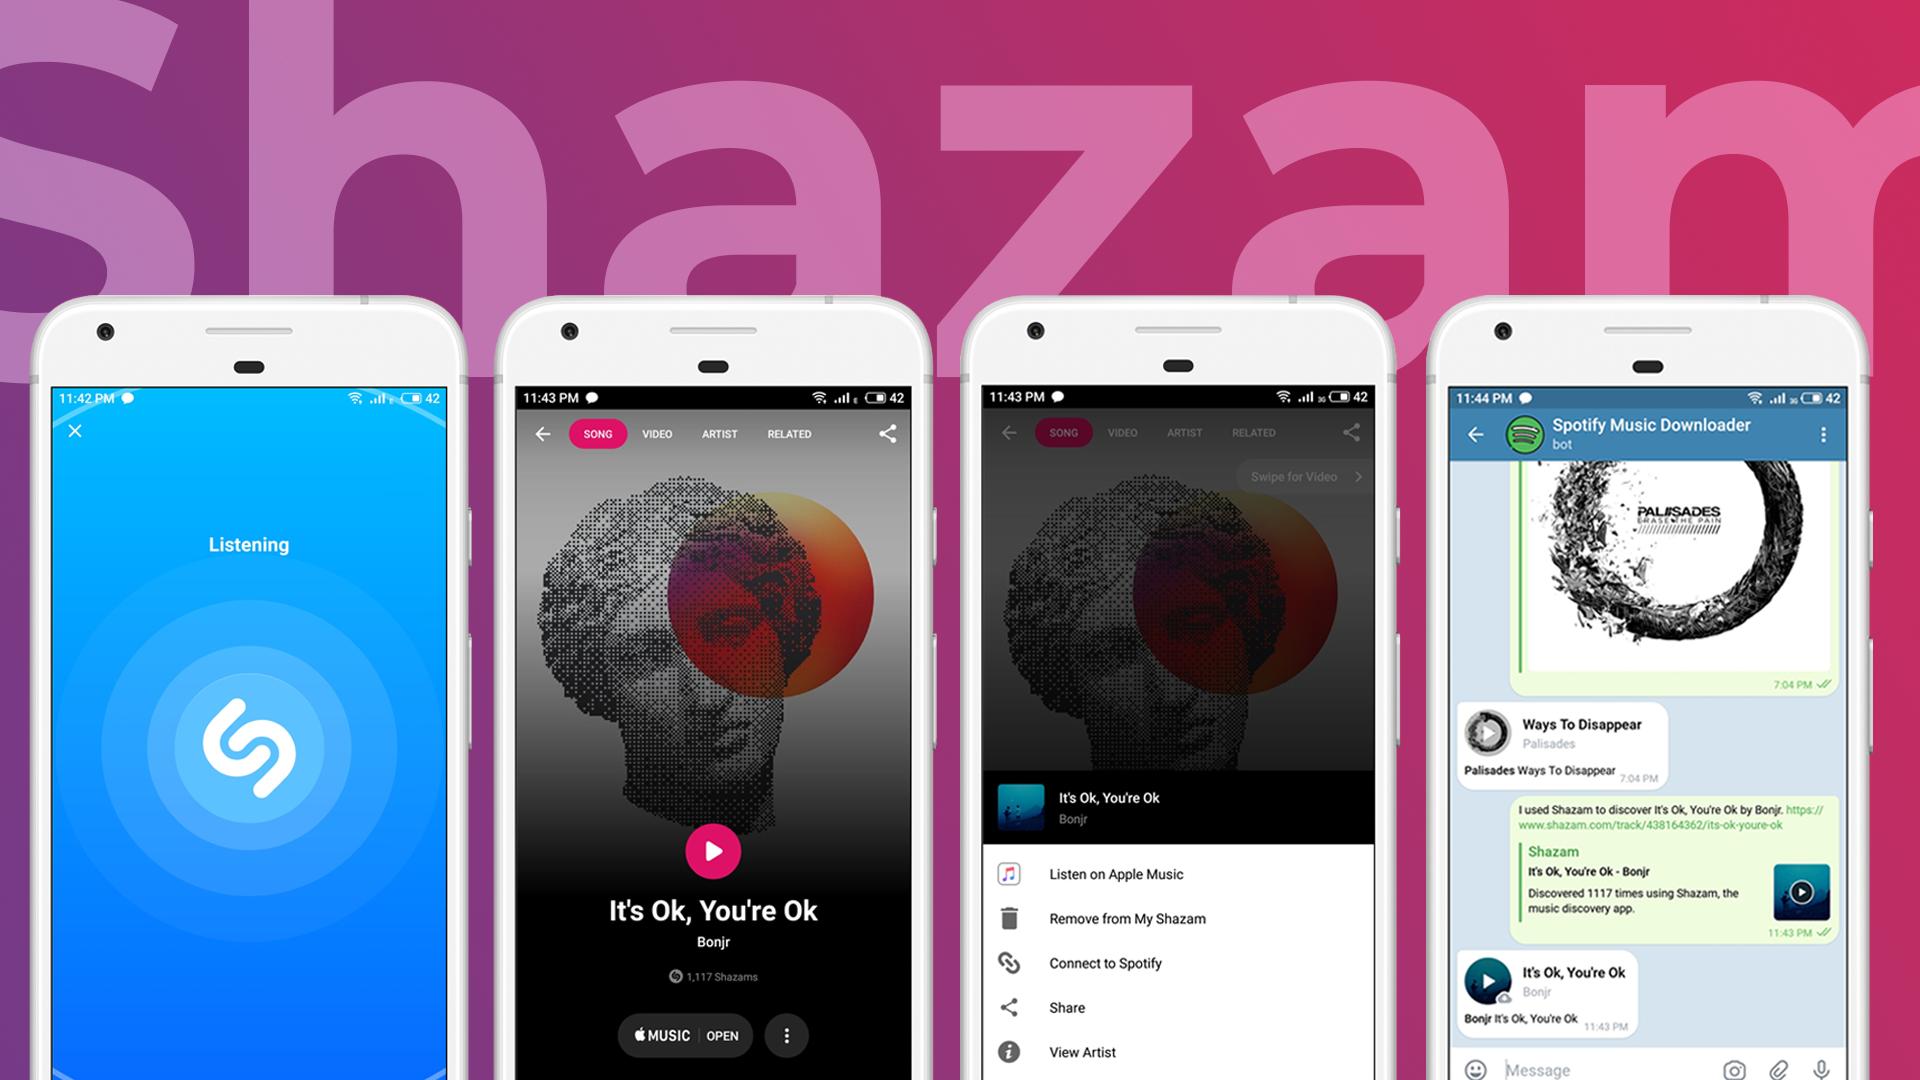 GitHub - artyshko/smd: Spotify Music Downloader